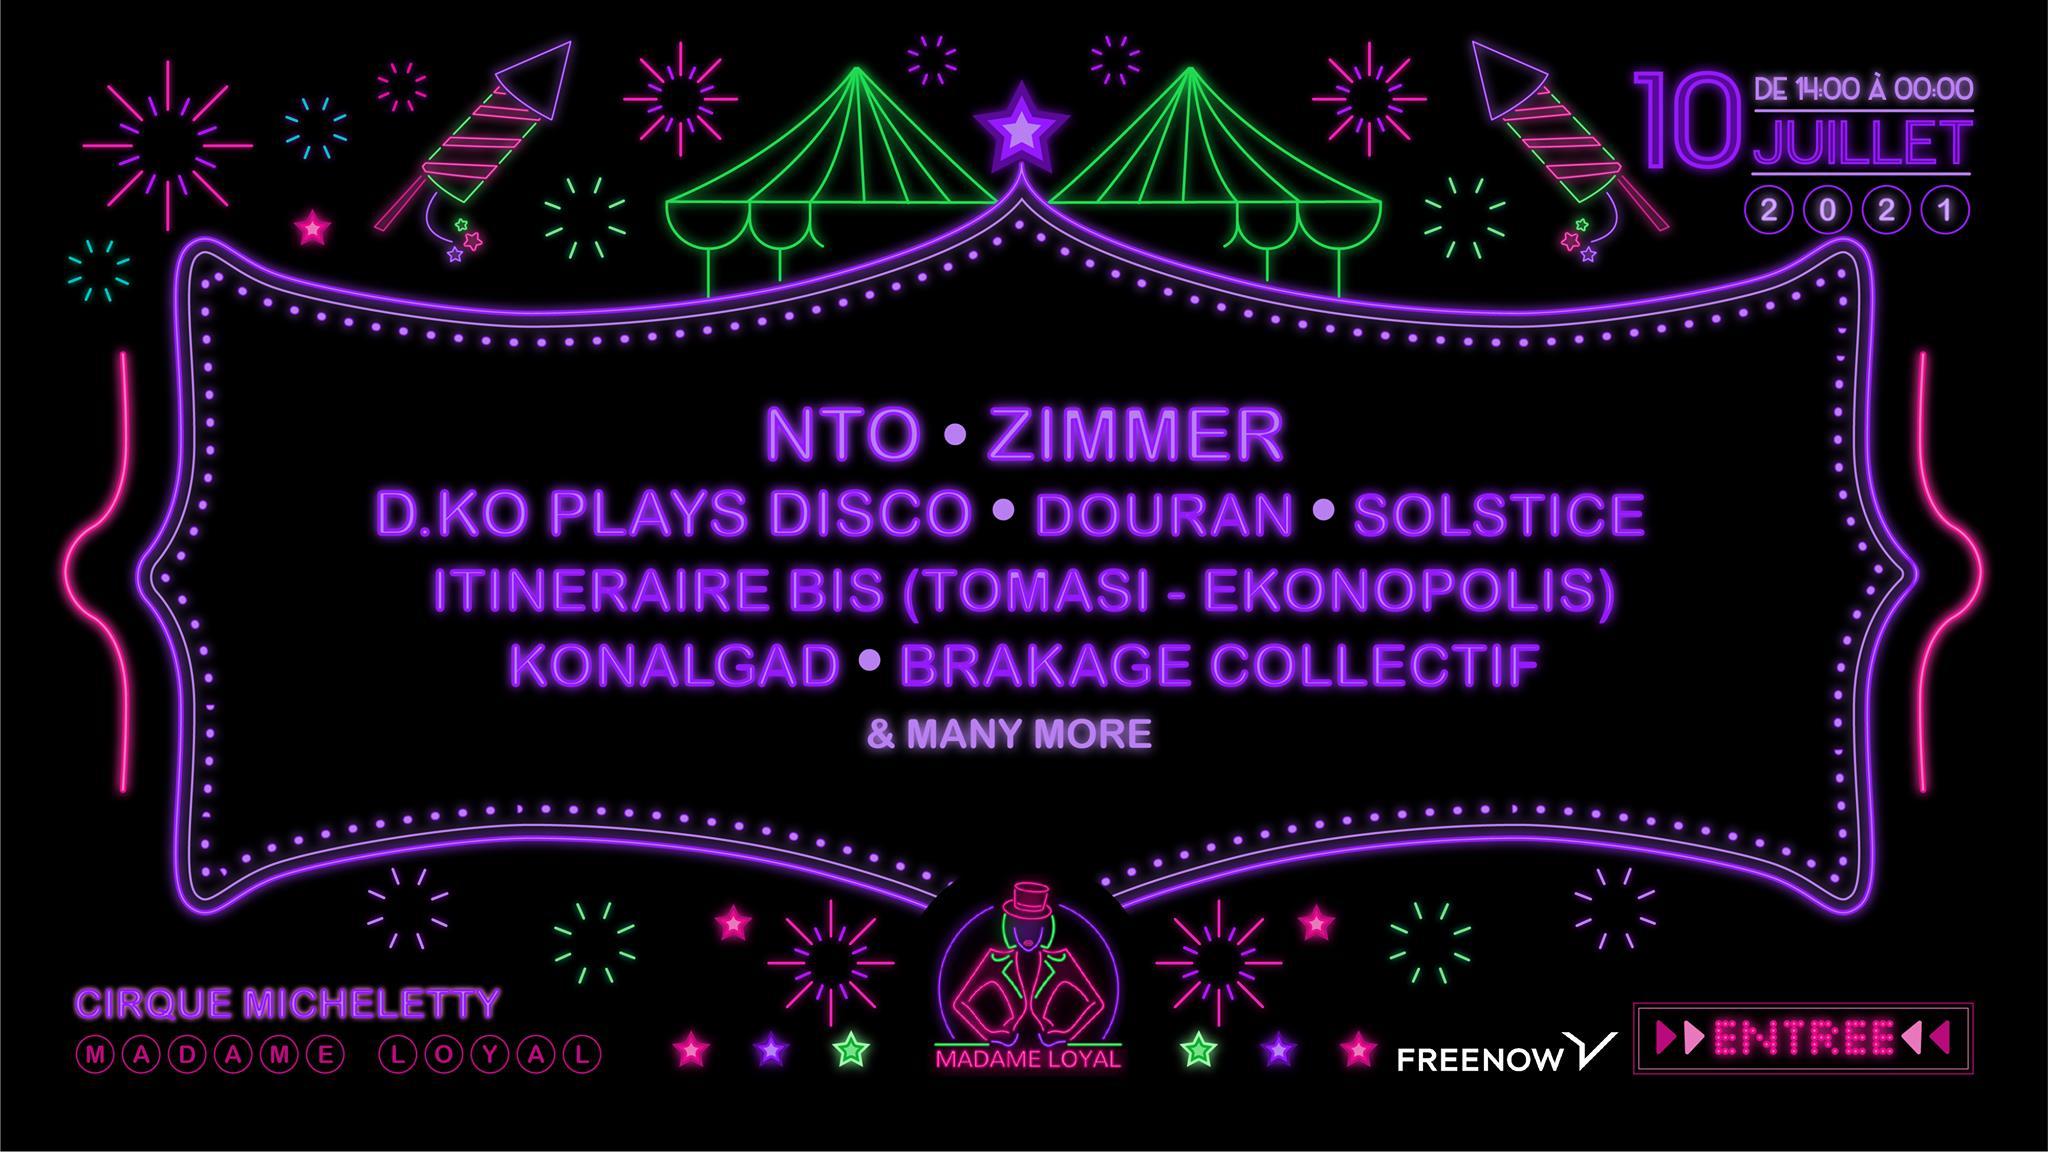 Madame Loyal : NTO, Zimmer, DKO play disco & many more